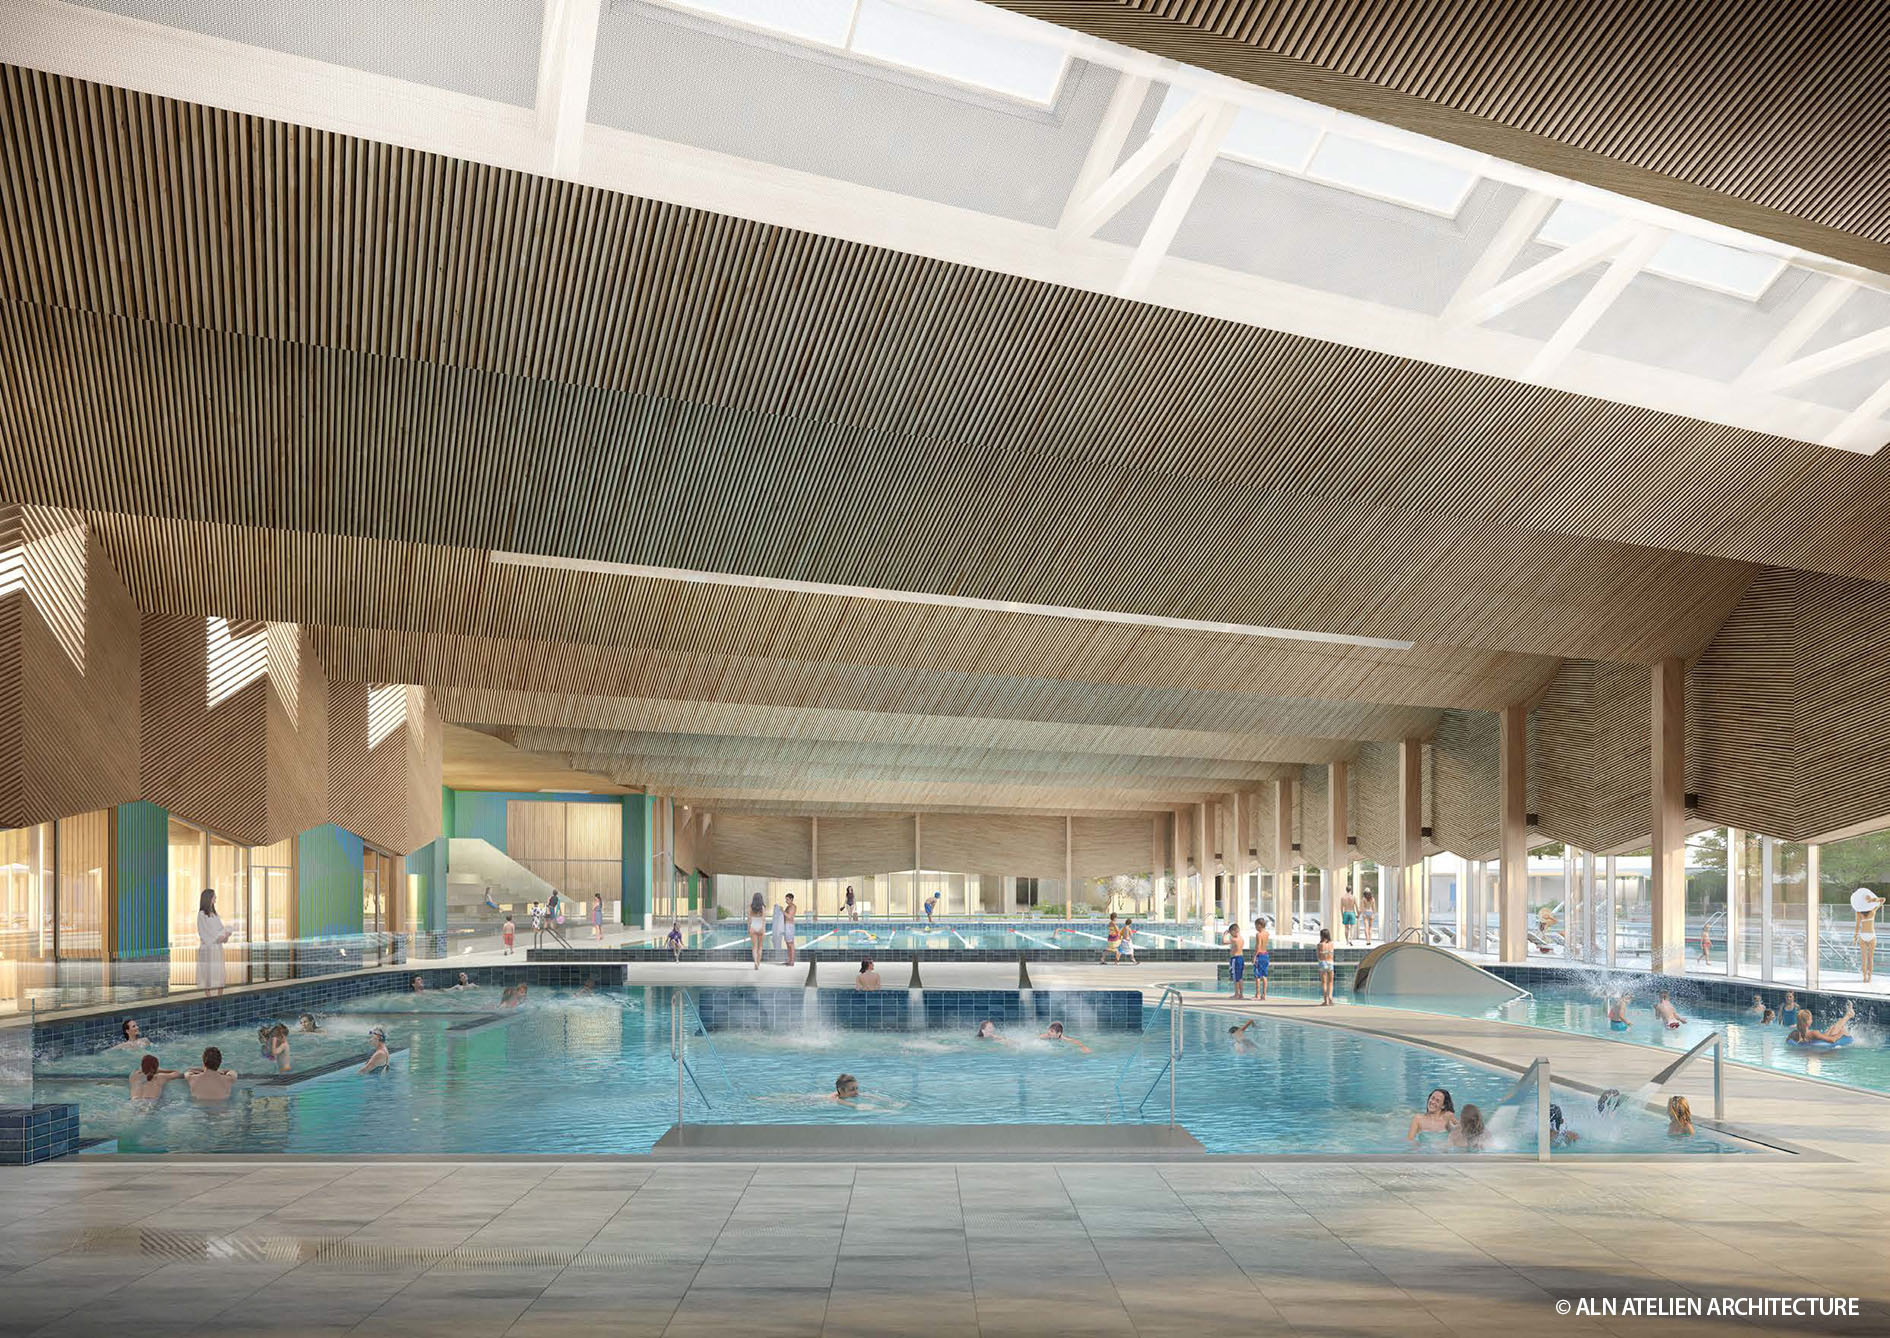 Piscine chamb ry 73 cbs cbt for Chambery metropole piscine